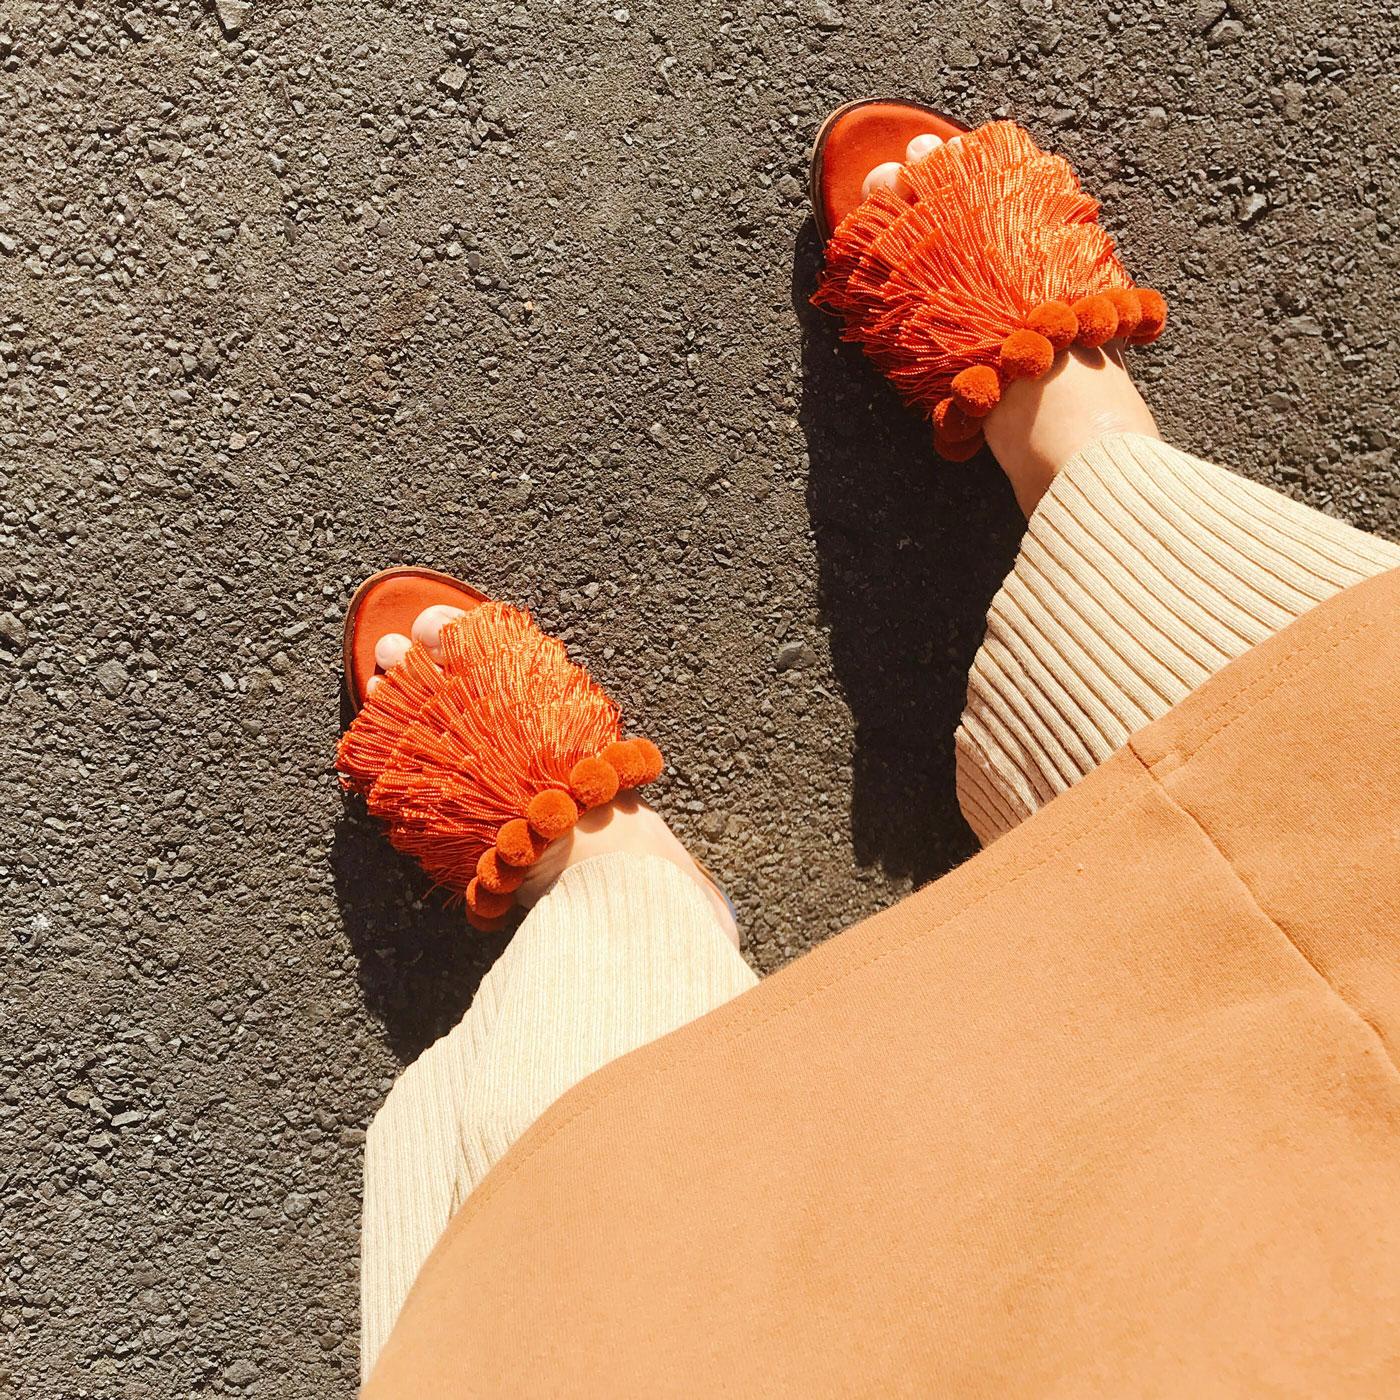 『ZARA』のセールで買ったオレンジ色のサンダル